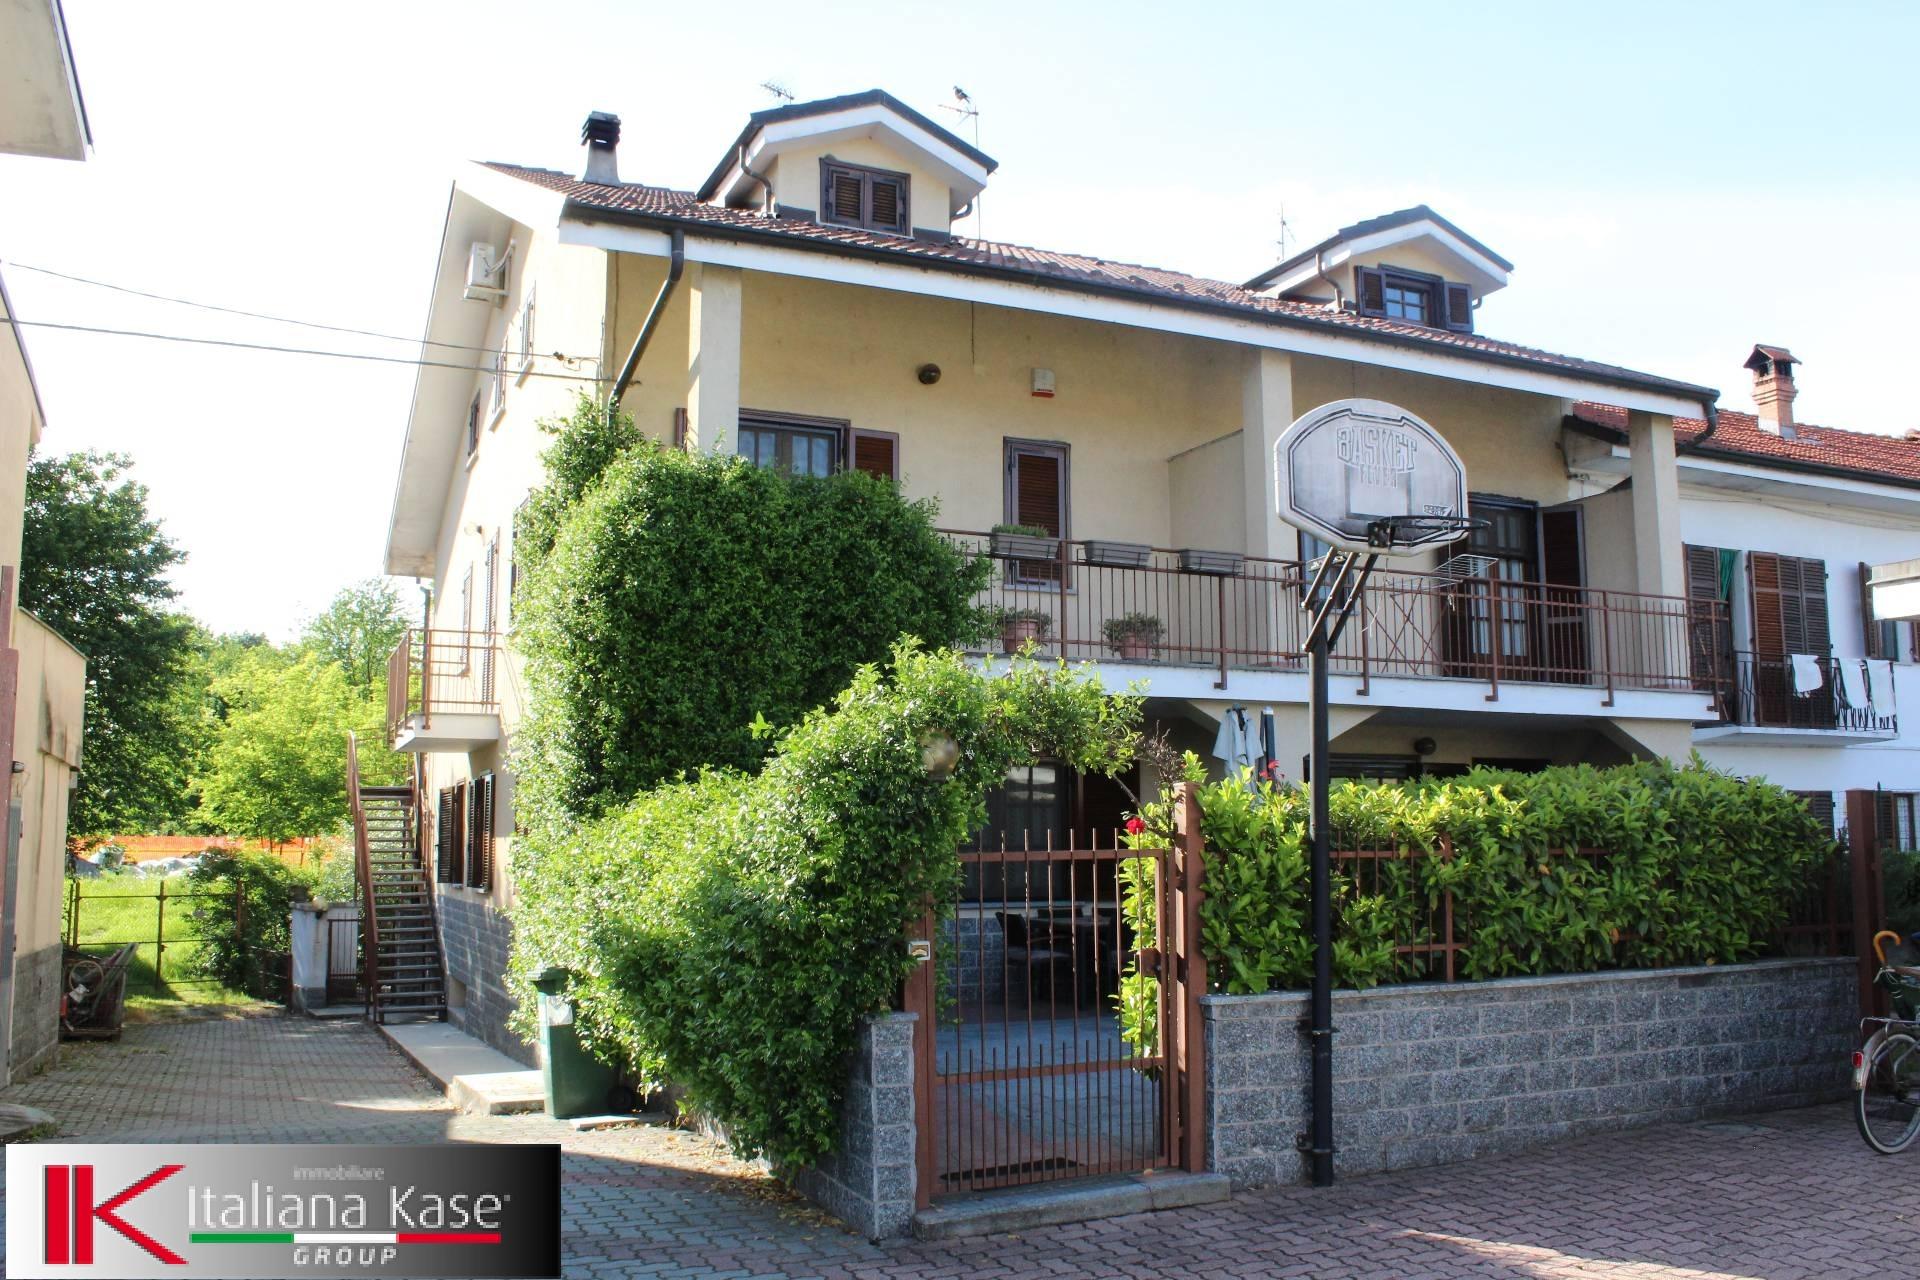 Foto 1 di Villetta a schiera Brandizzo, San Mauro Torinese